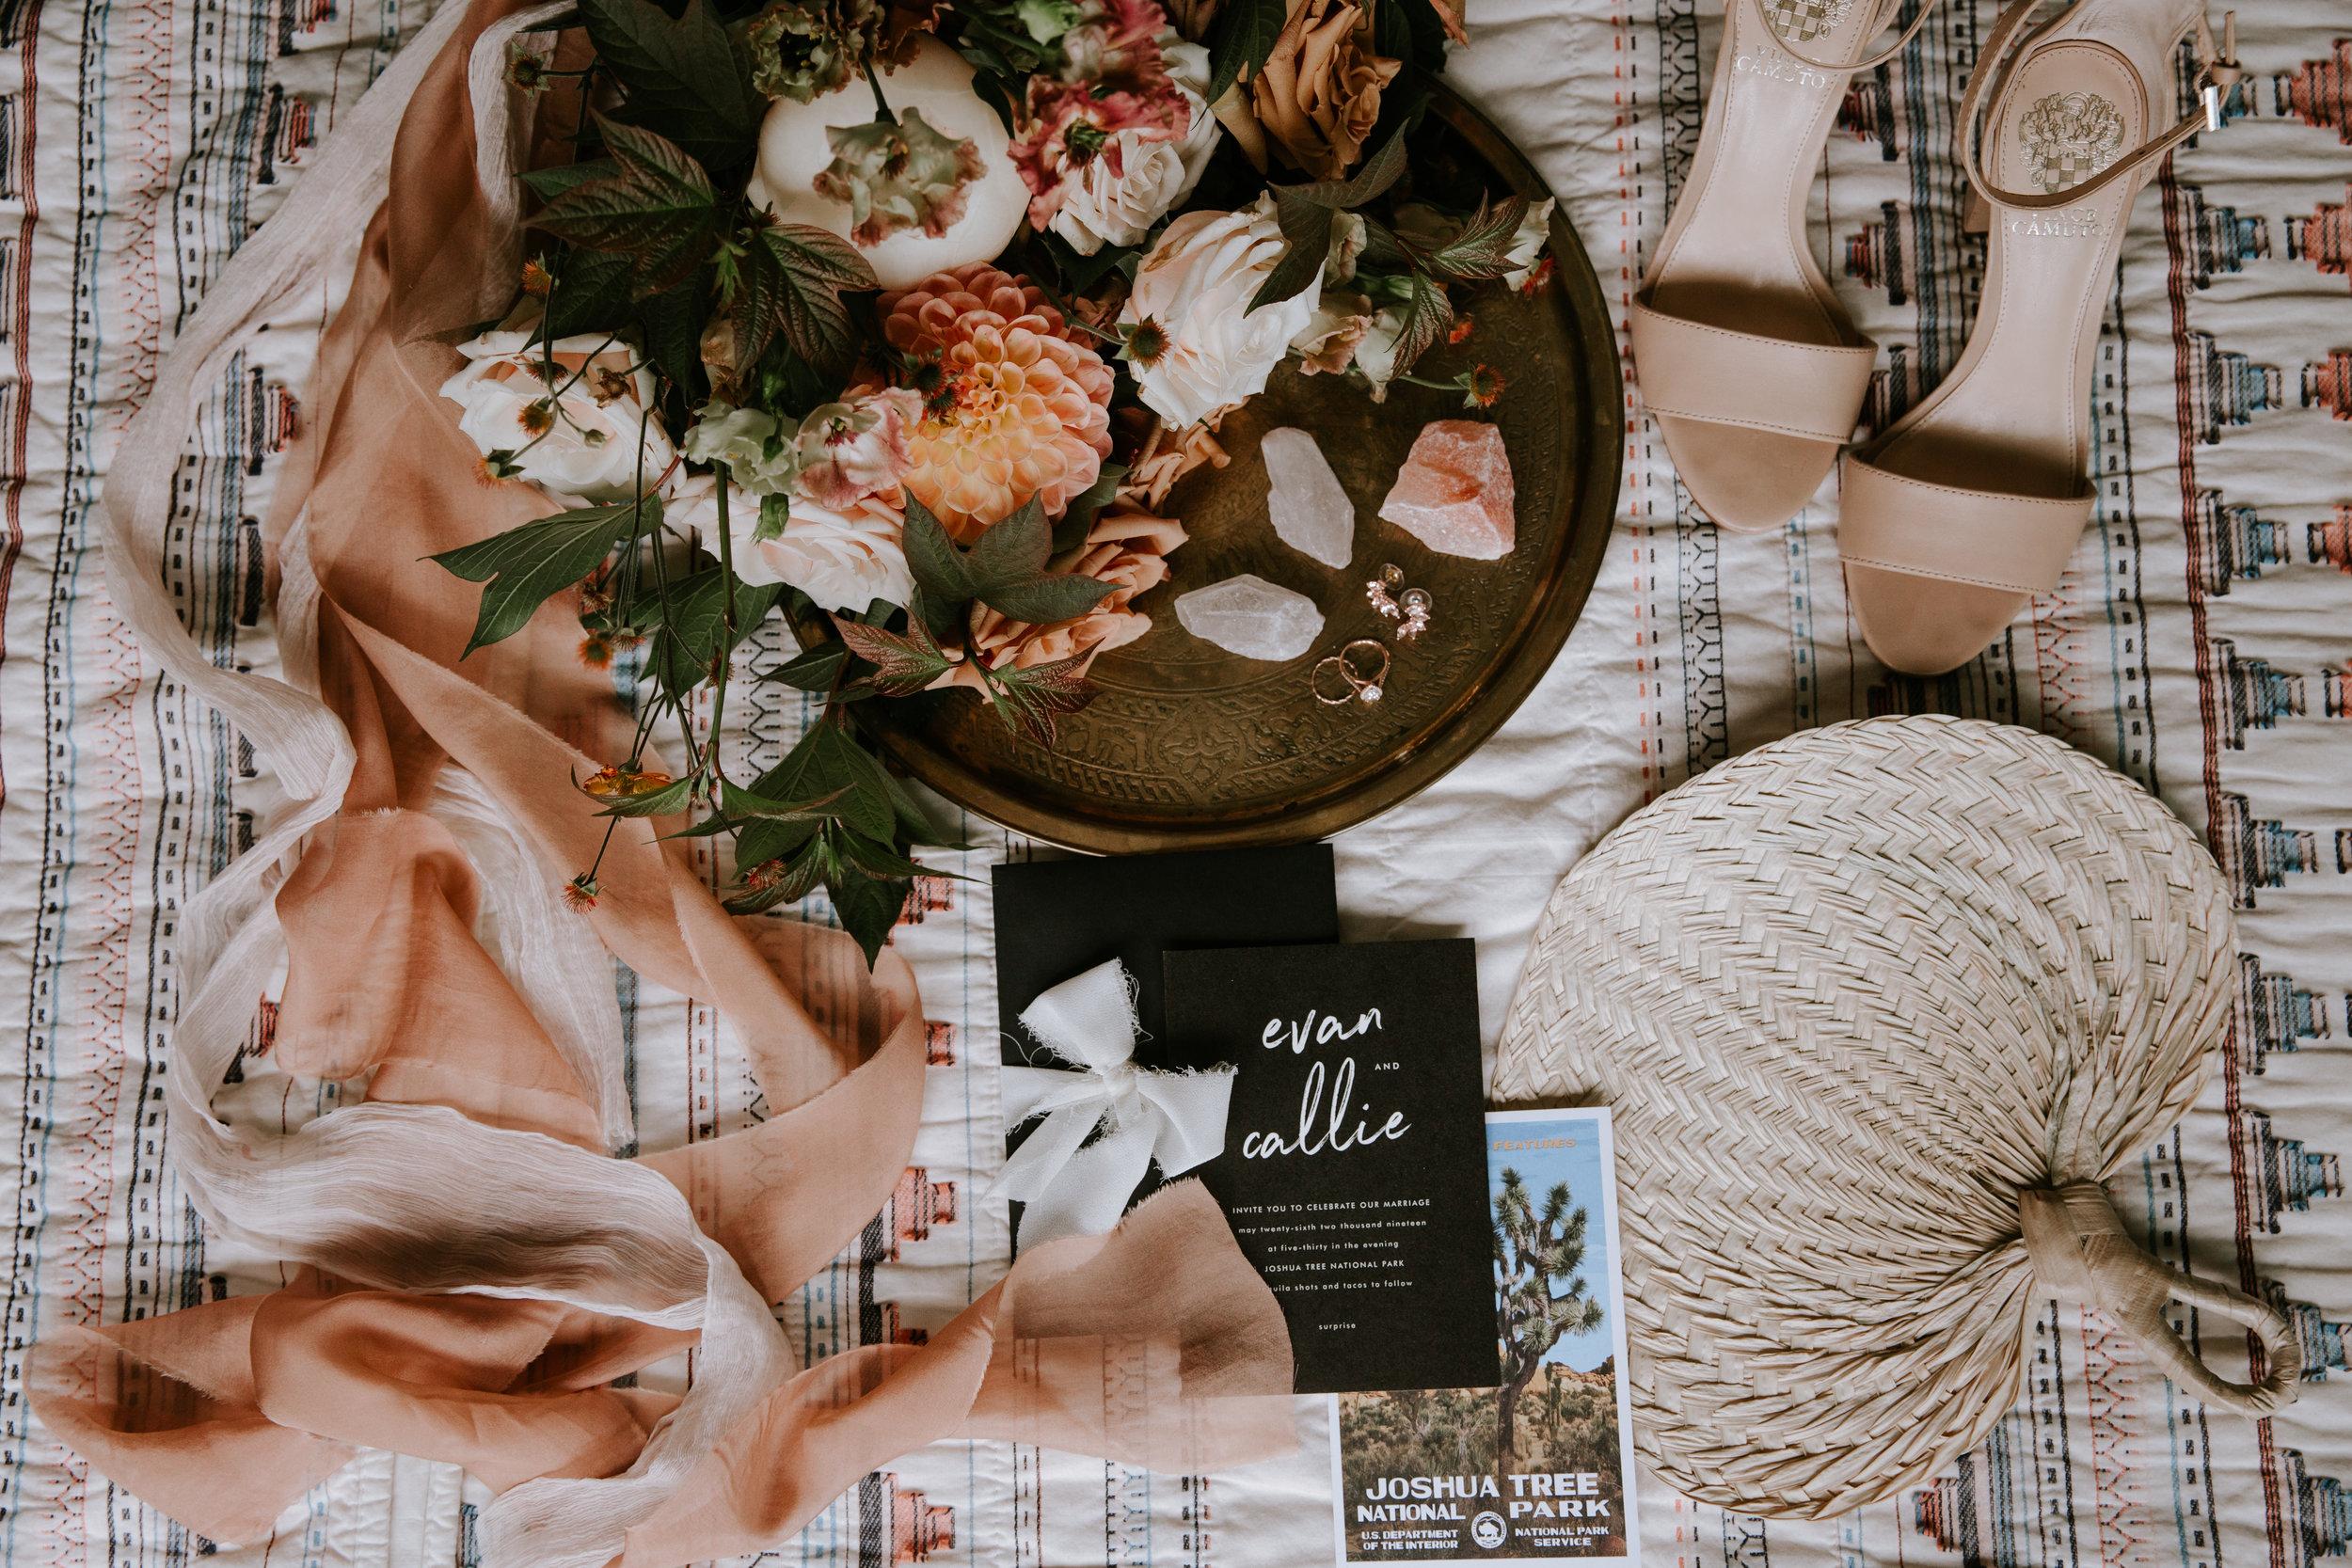 2019-05-26_Callie-Evan_Wedding_Joshua Tree_Paige Nelson_PREVIEWS HR-9.jpg